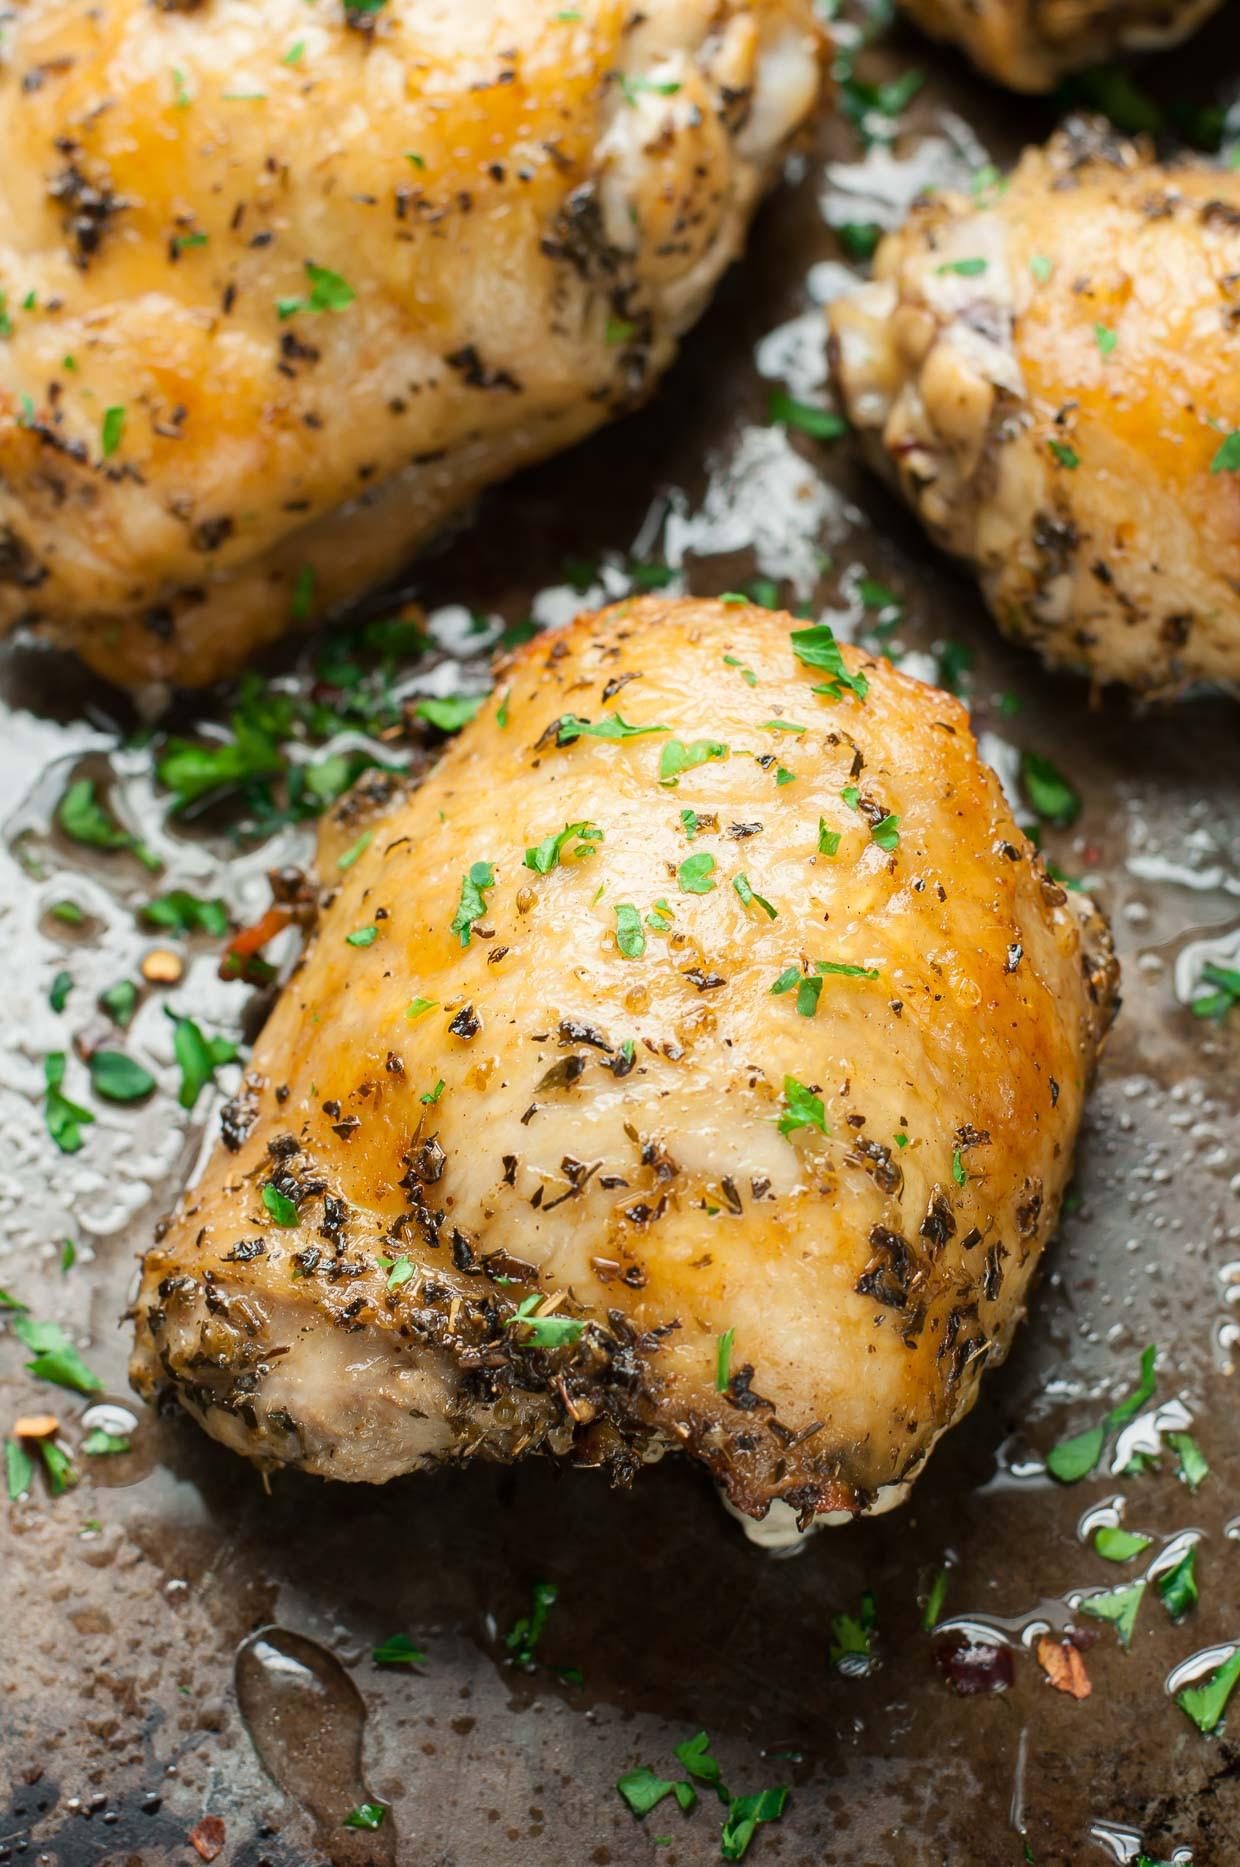 Baked Chicken Marinade  Crispy Baked Chicken Thighs with Garlic Turmeric Rice